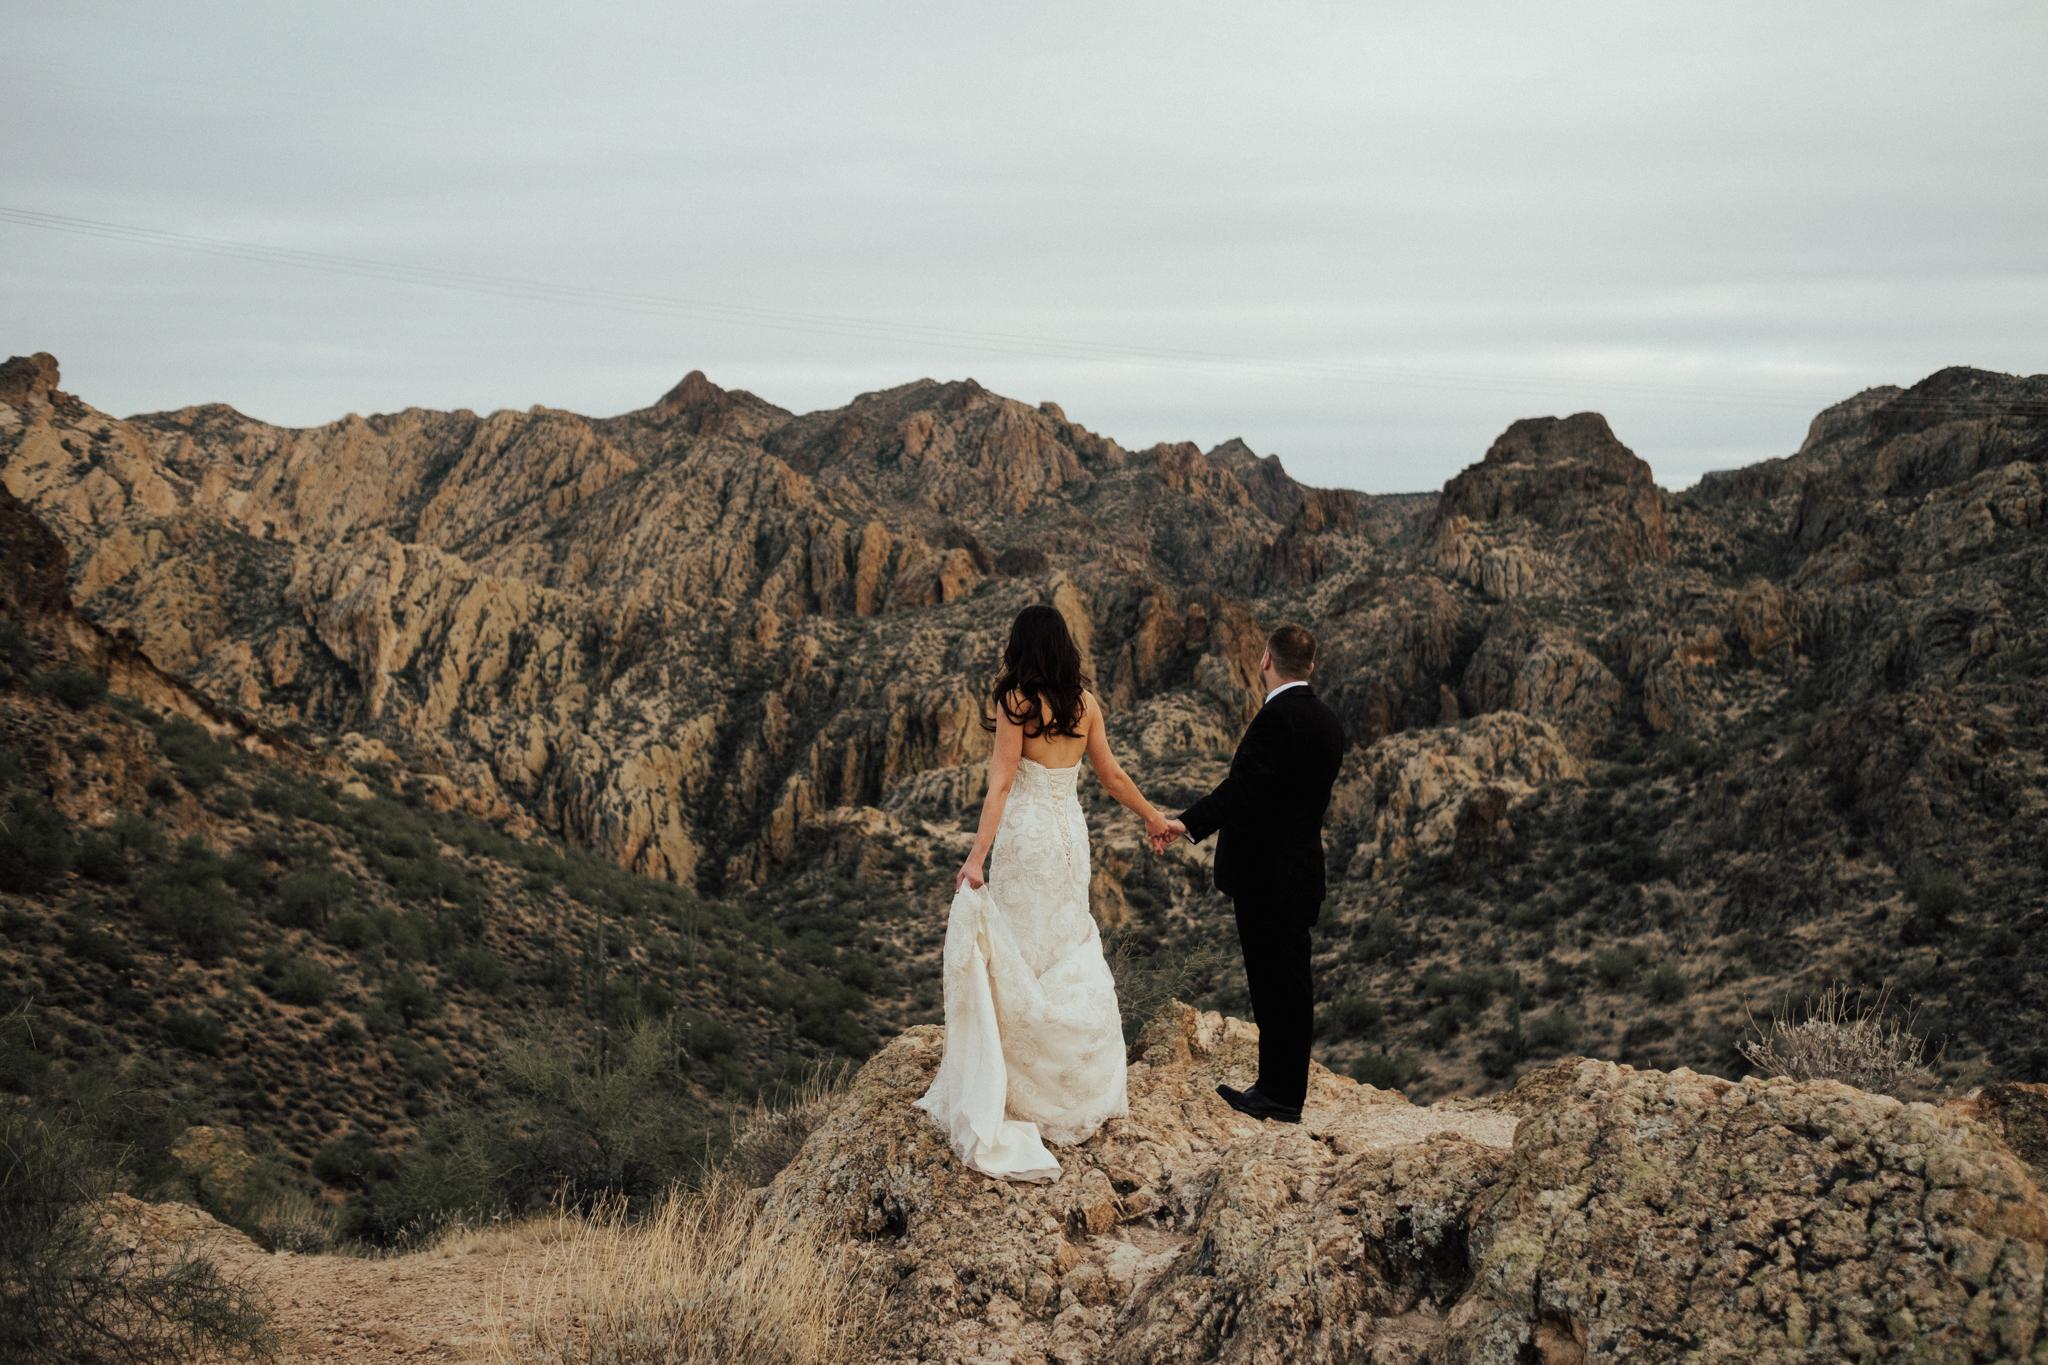 Arizona-Adventure-Elopement-Wedding-Photographer-36.jpg